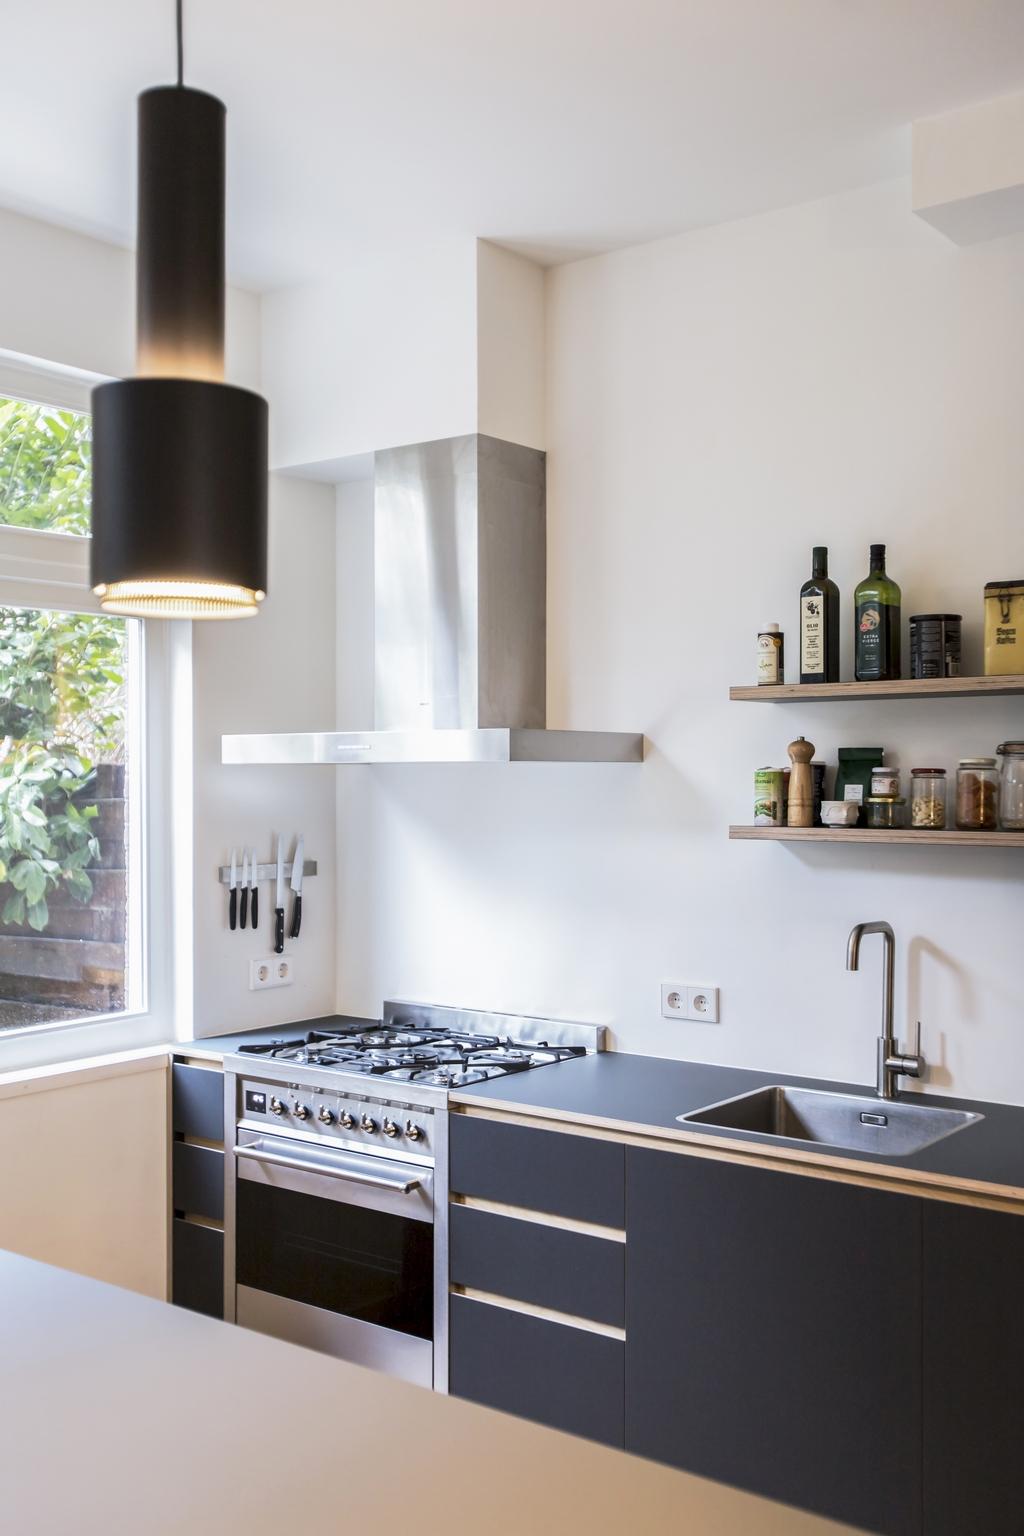 Greeploze keuken met SMEG fornuis - Amsterdam Zuid